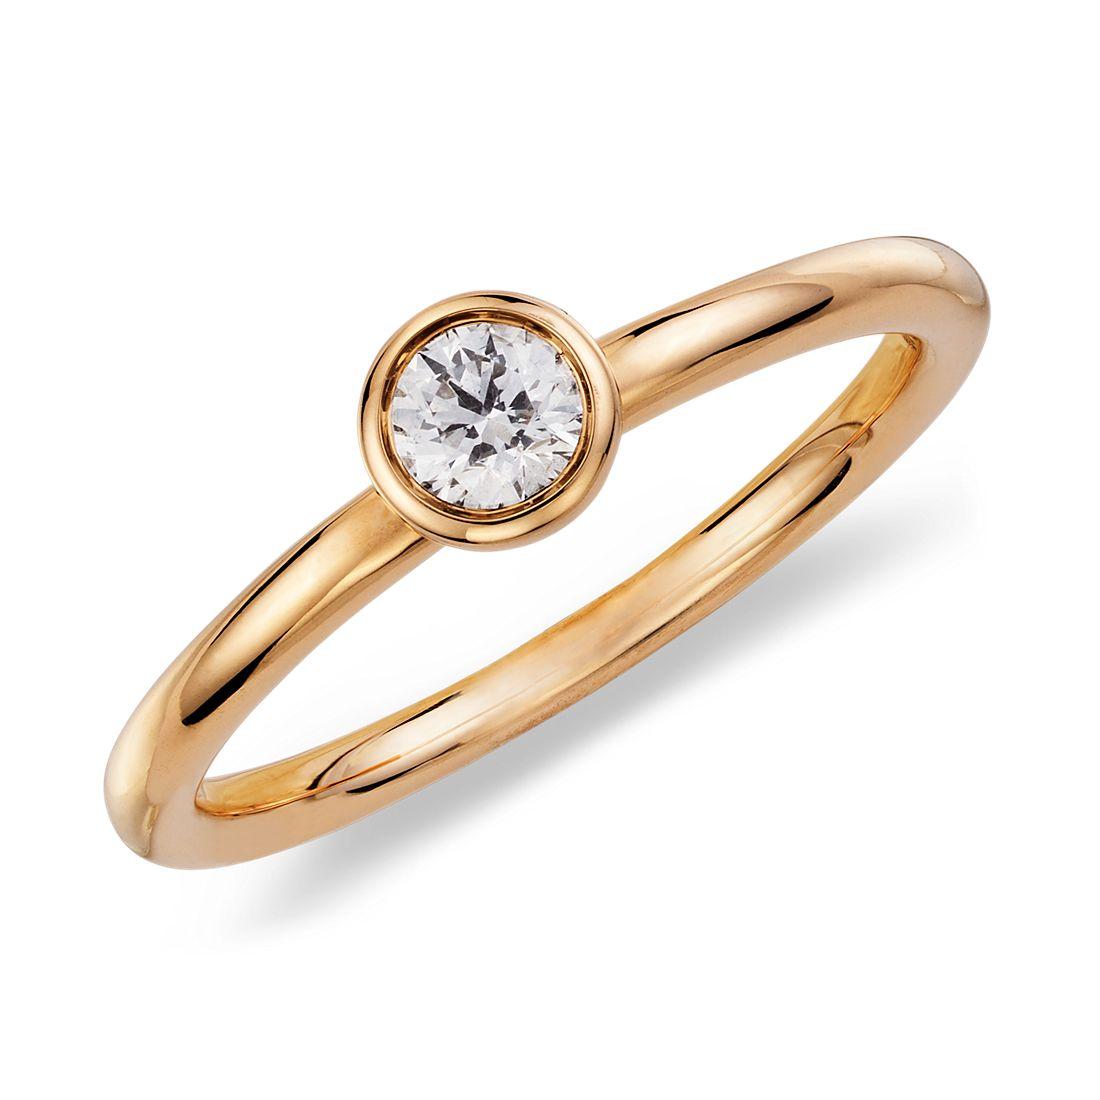 Bague diamant rond serti clos en or jaune 14carats (1/5carat, poids total)